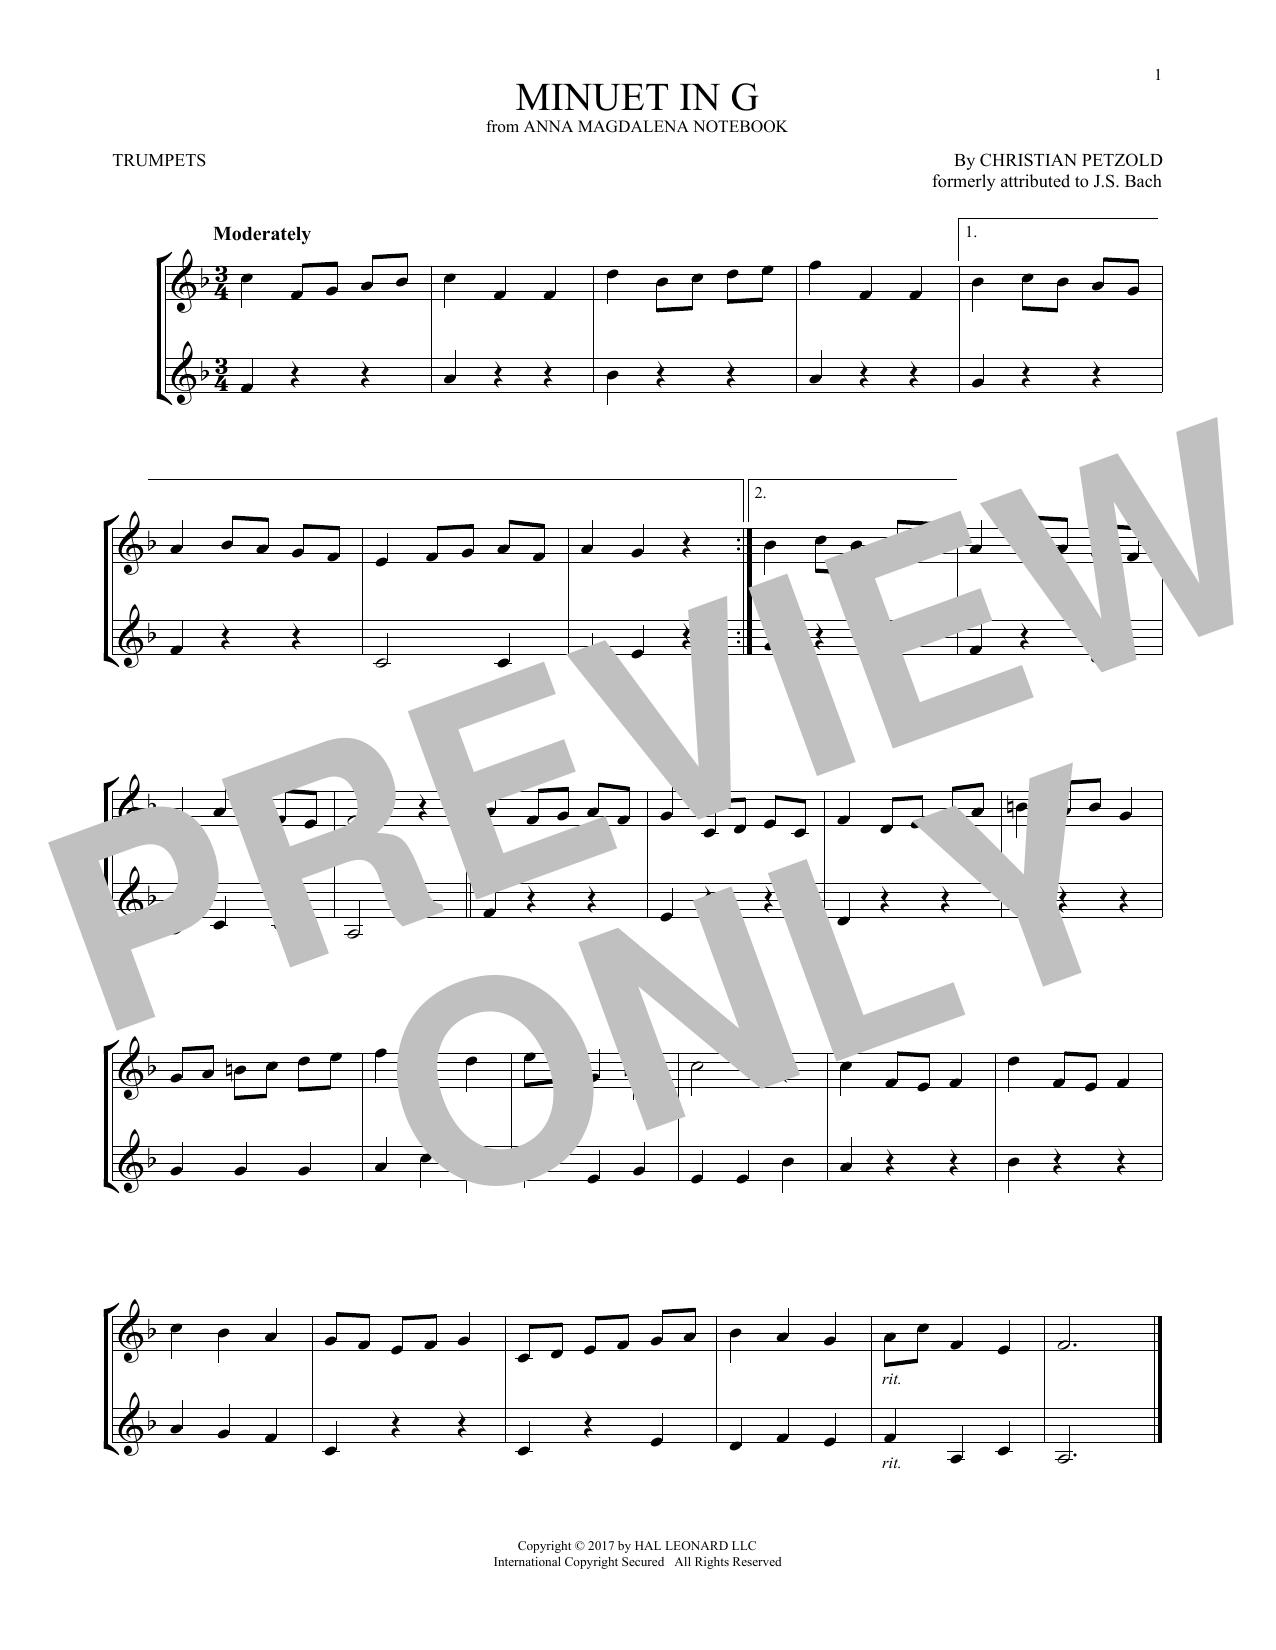 Minuet In G Major, BWV Anh. 114 (Trumpet Duet)